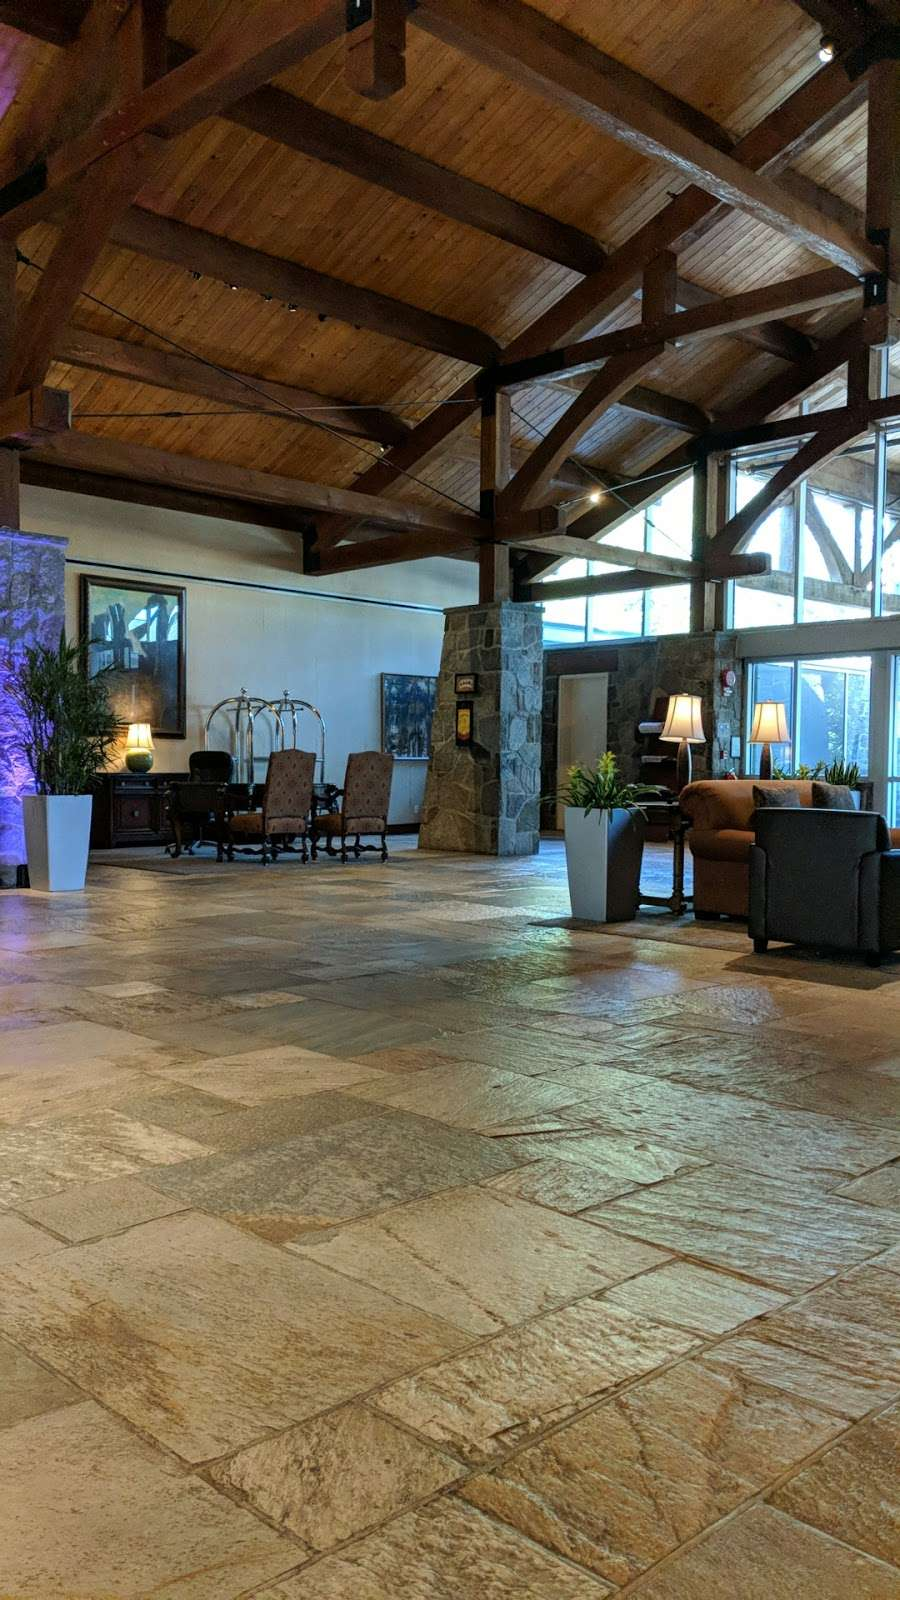 Hilton Tarrytown Hotel - lodging    Photo 1 of 1   Address: 455 S Broadway, Tarrytown, NY 10591, USA   Phone: (914) 631-5700